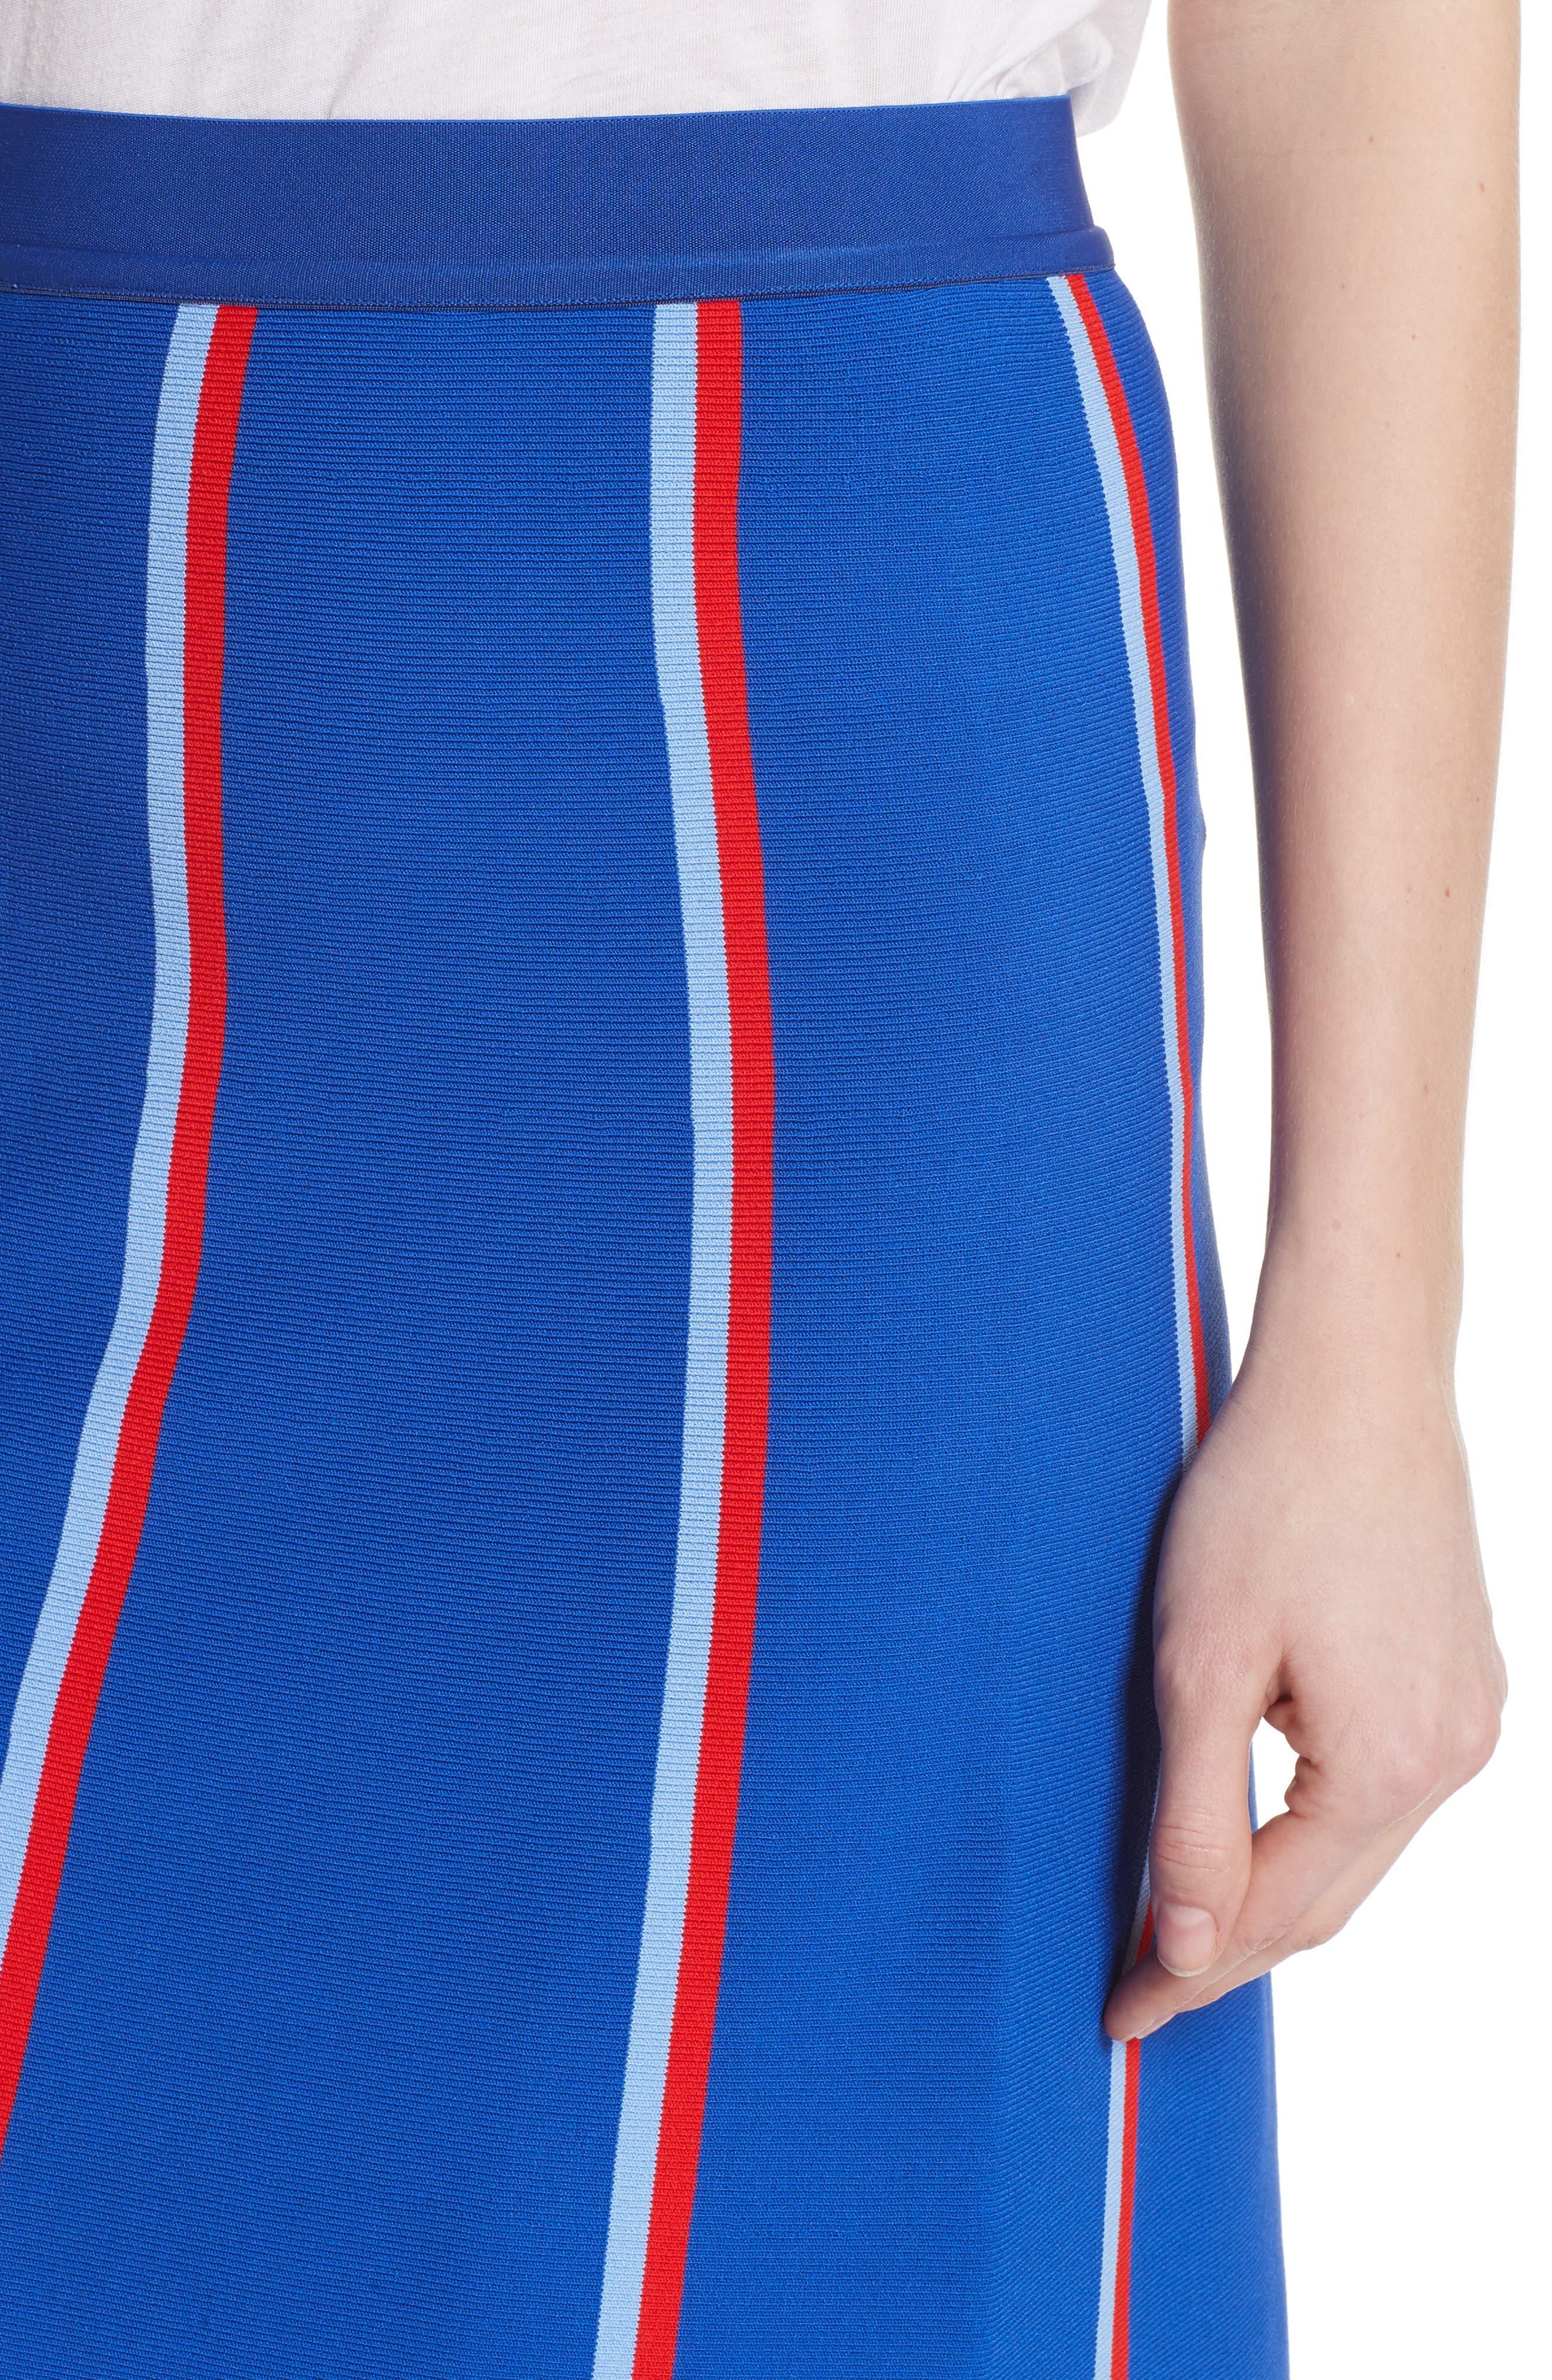 Twin Stripe Tech Knit Skirt,                             Alternate thumbnail 4, color,                             SLALOM BLUE